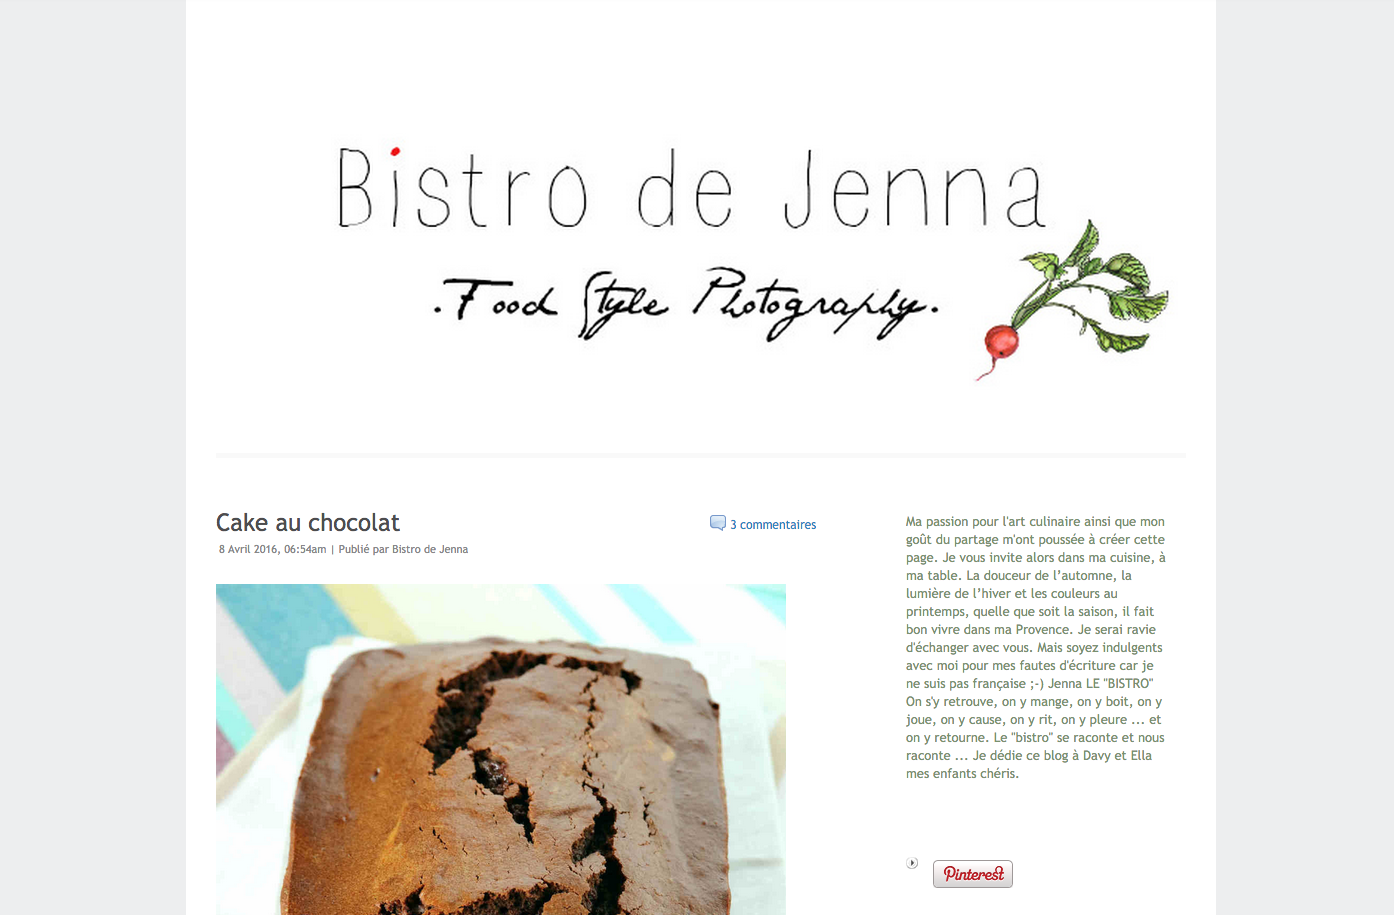 http://www.bistrodejenna.com/